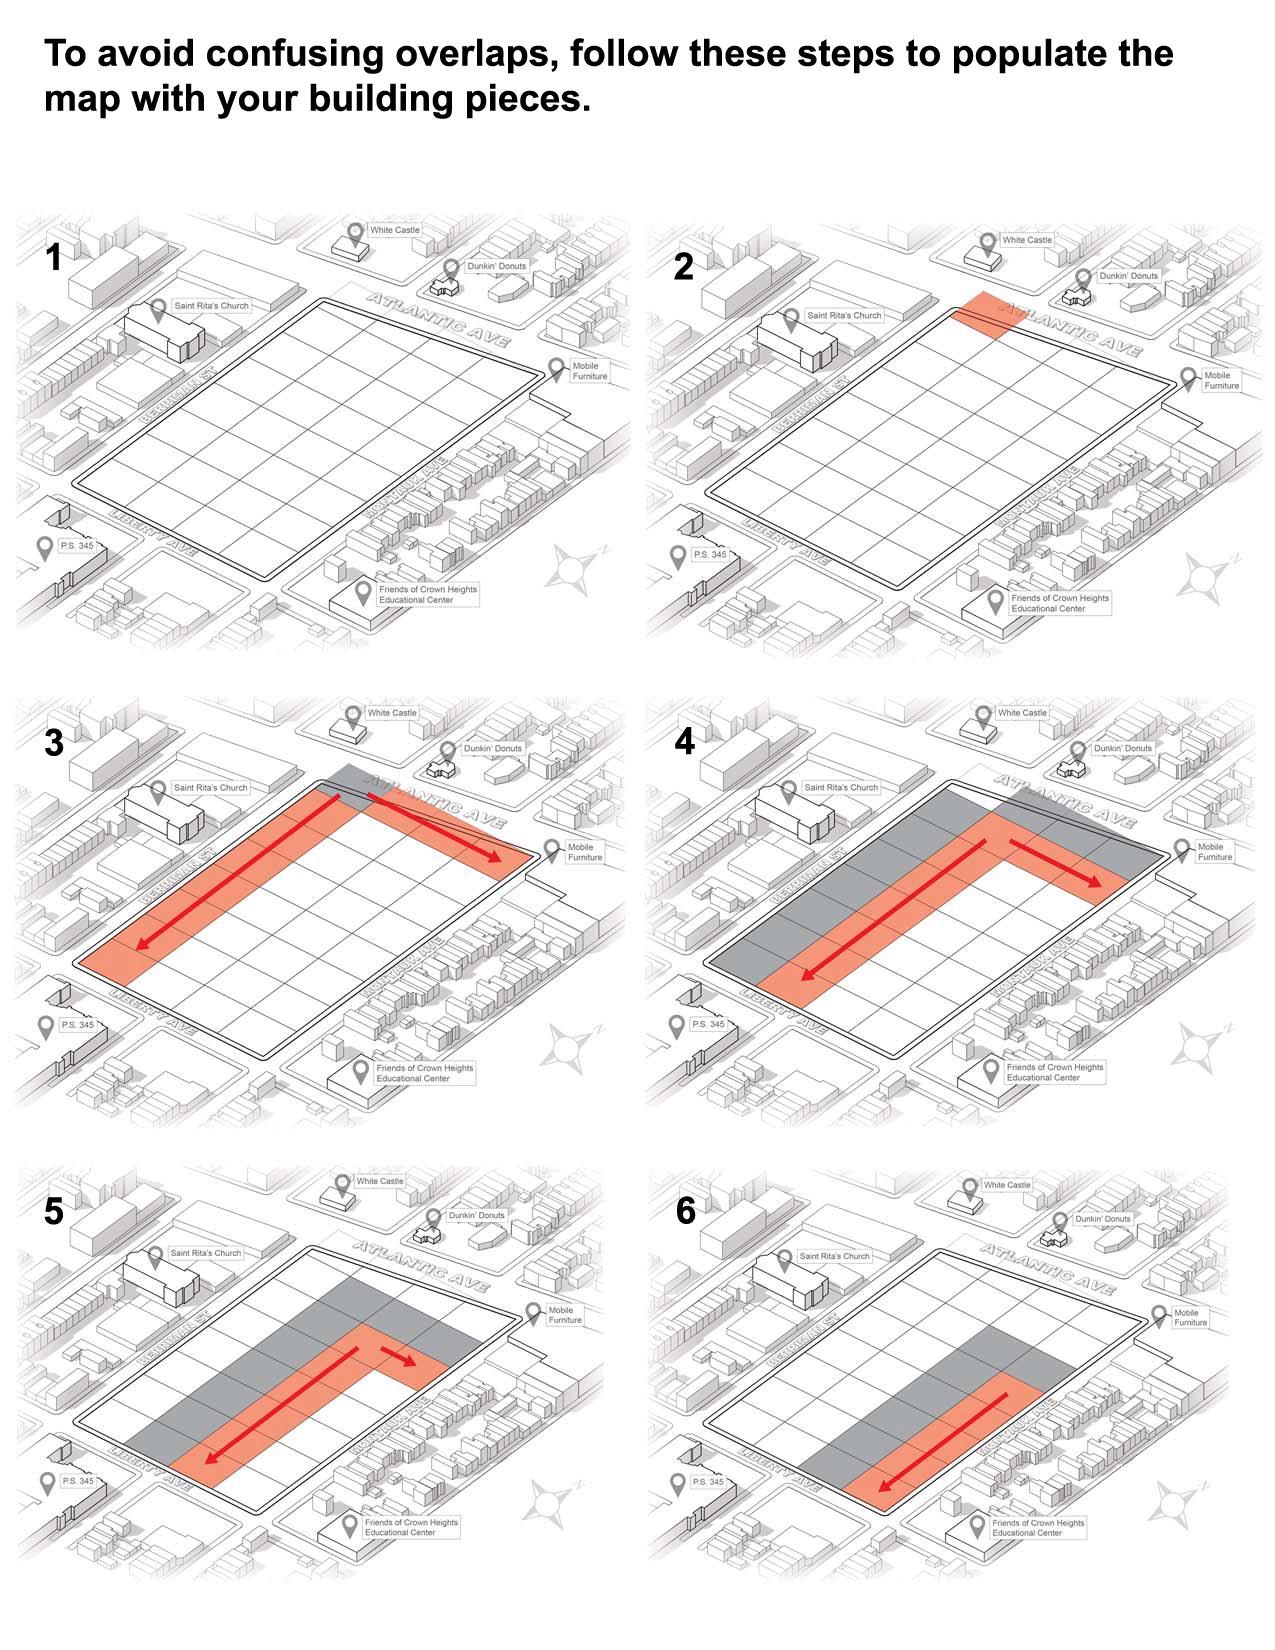 Instructions to avoid awkward overlaps